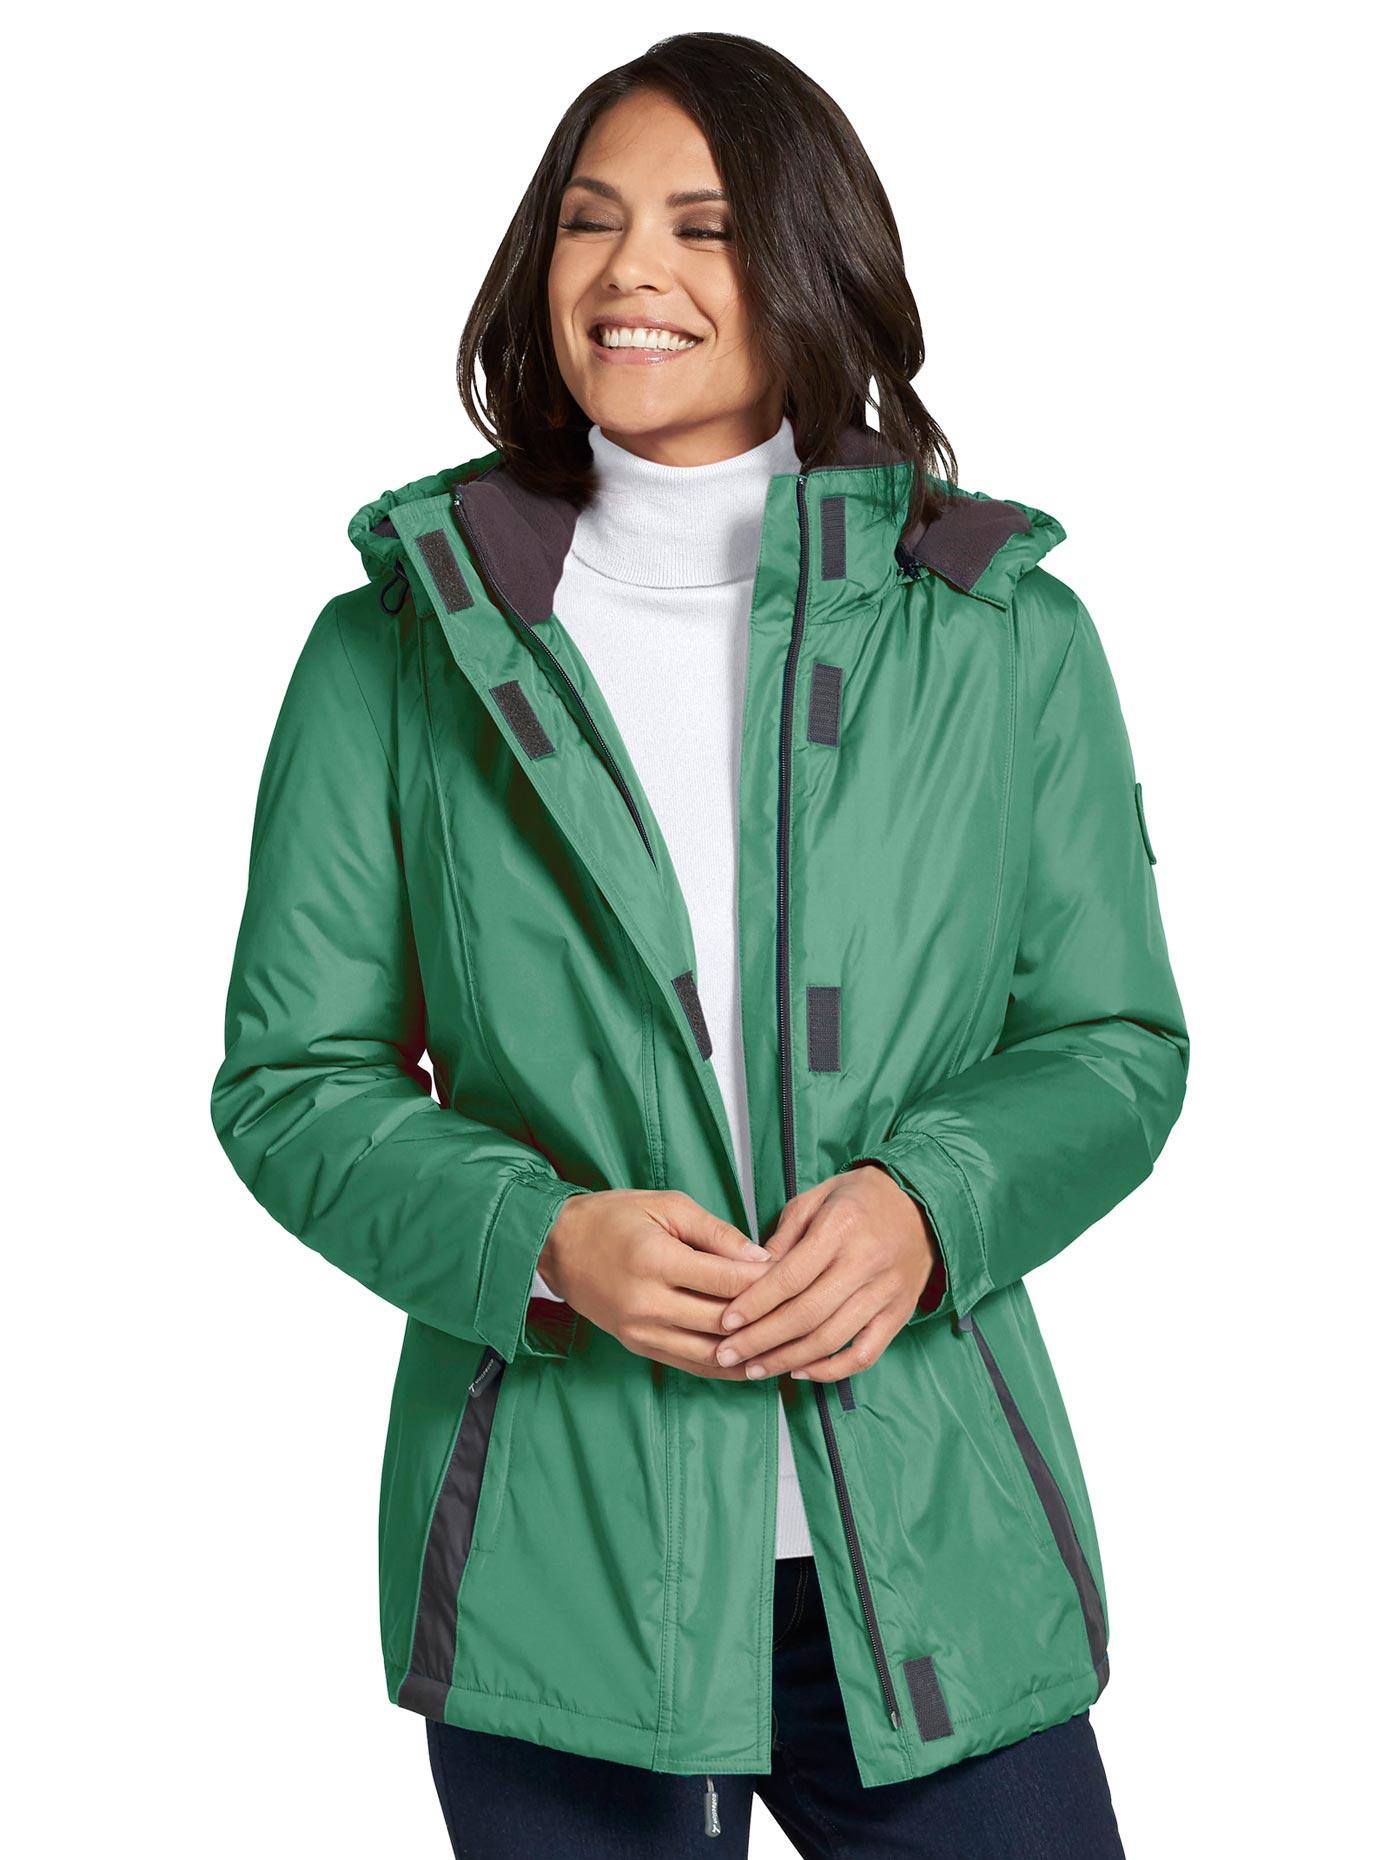 Casual Looks Funktionsjacke mit Stehkragen | Bekleidung > Jacken > Funktionsjacken | Grün | Fleece | Casual Looks